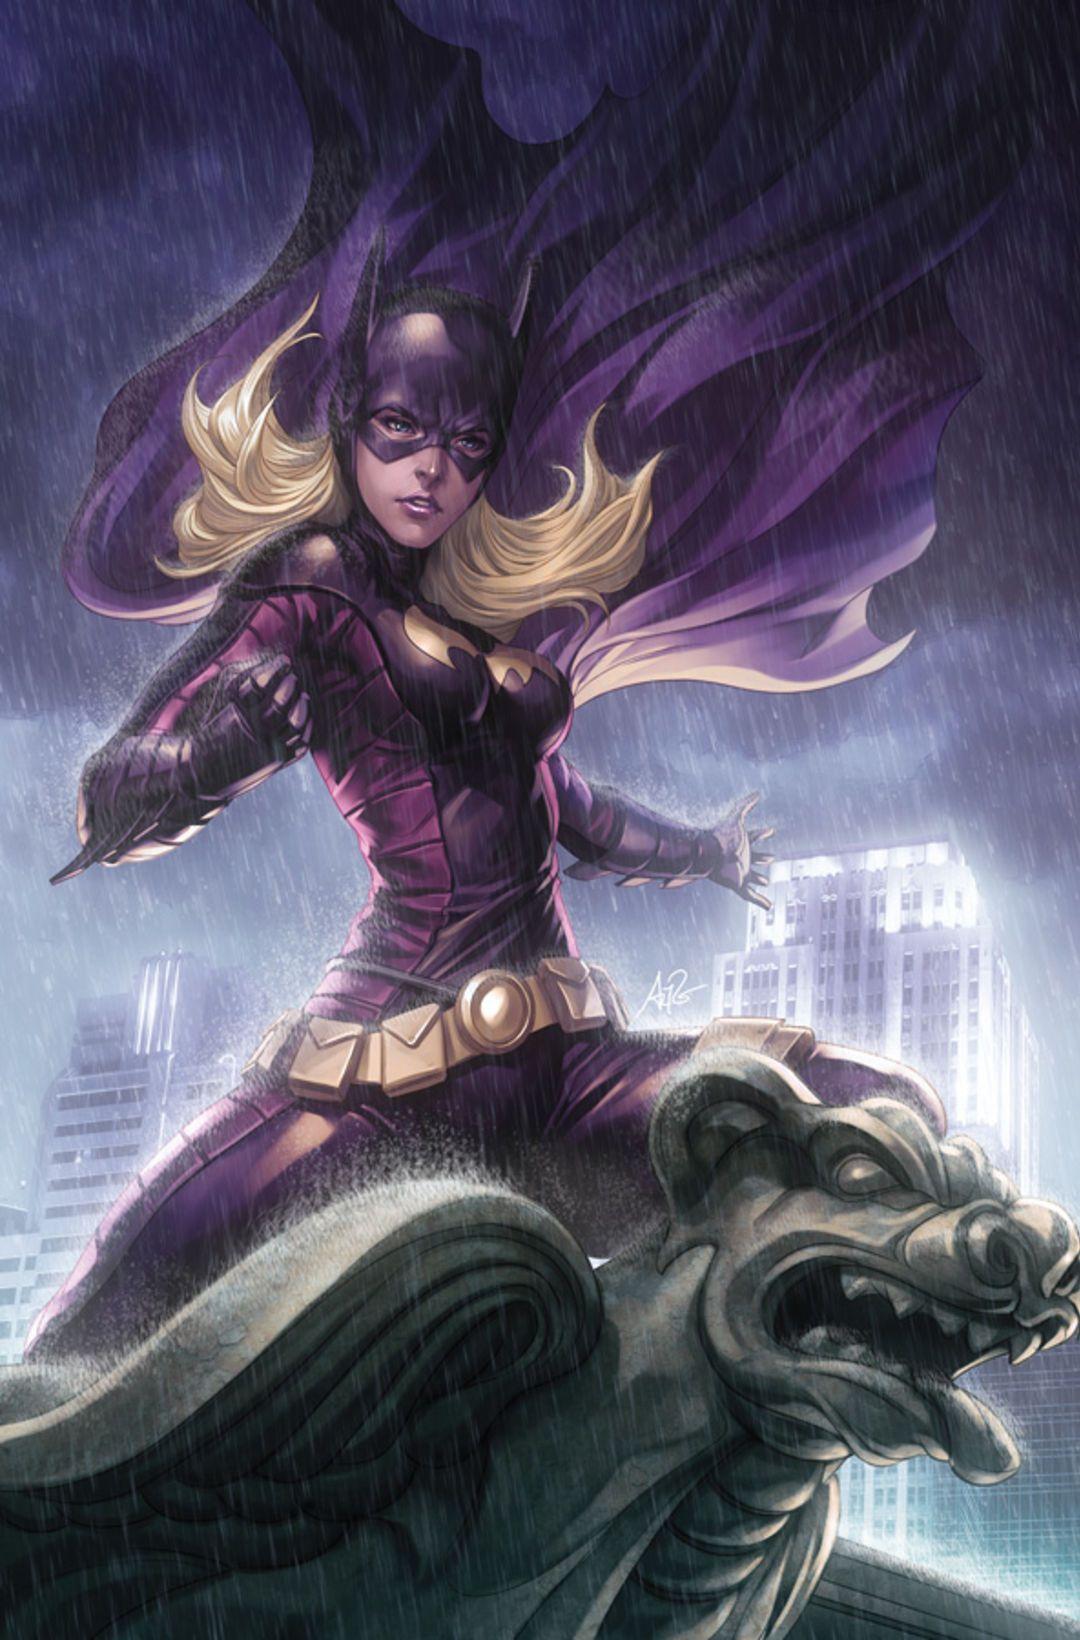 Batgirl issue #9